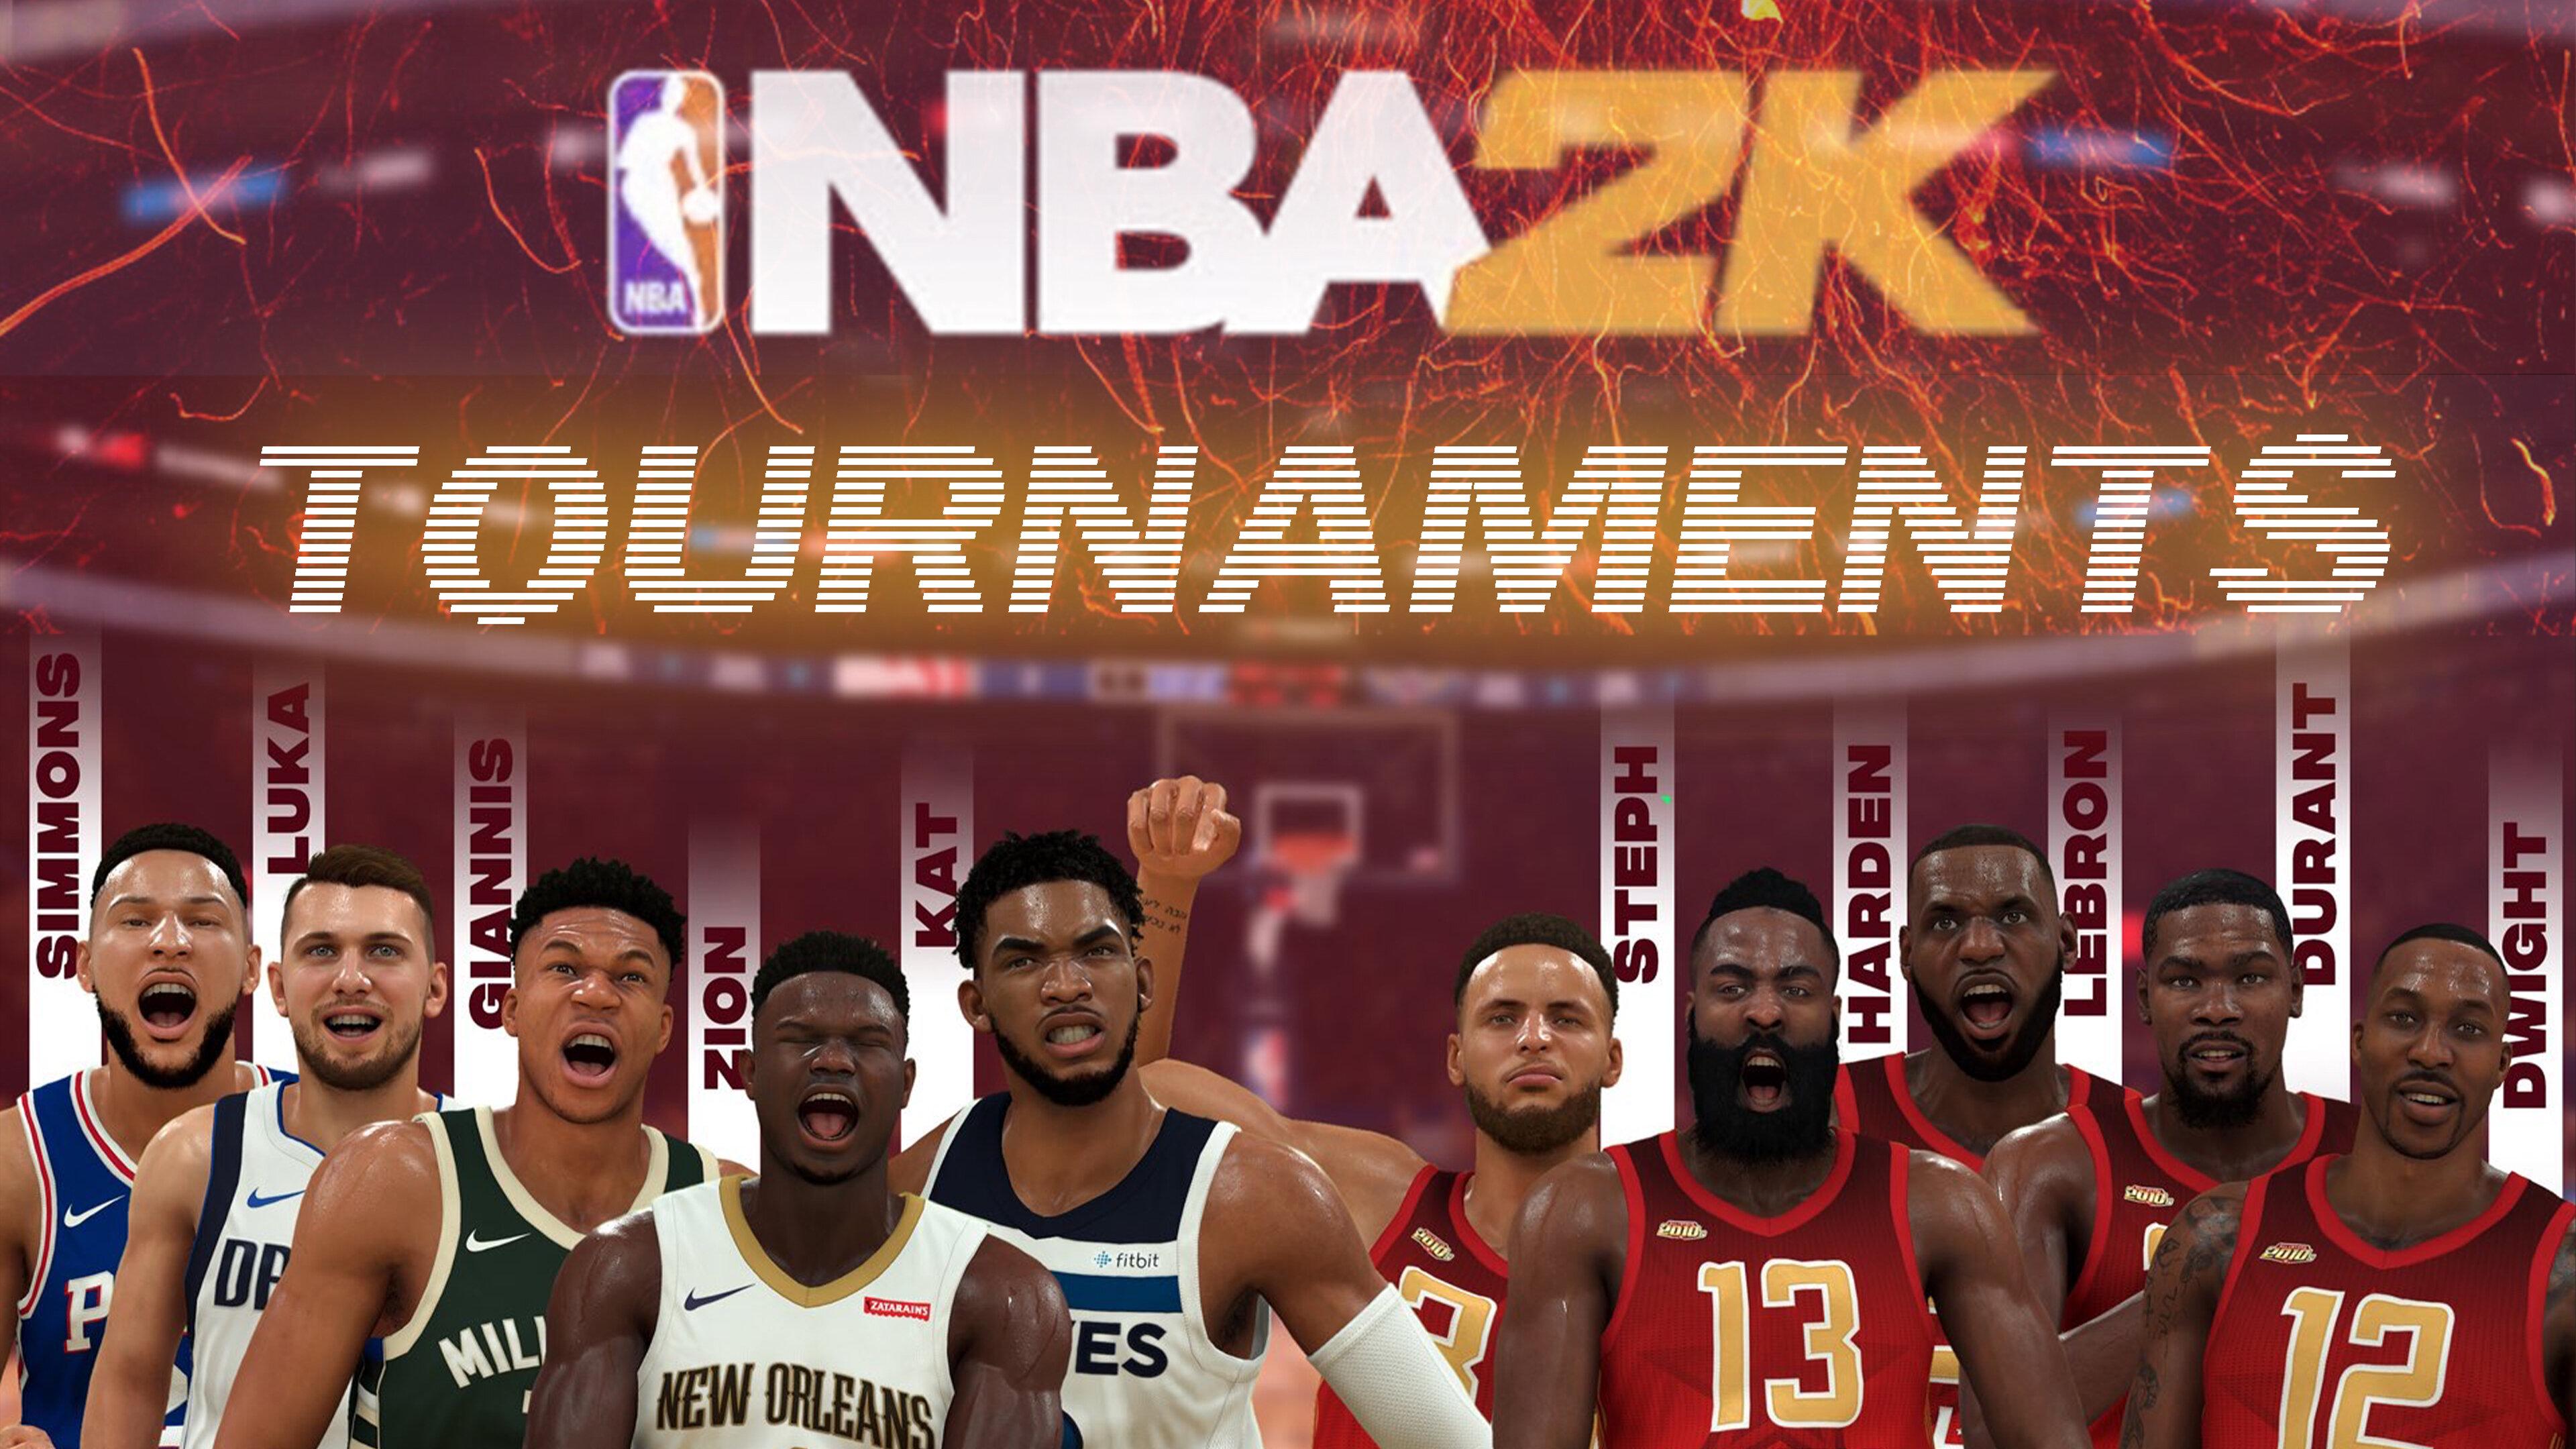 NBA 2K Tournaments